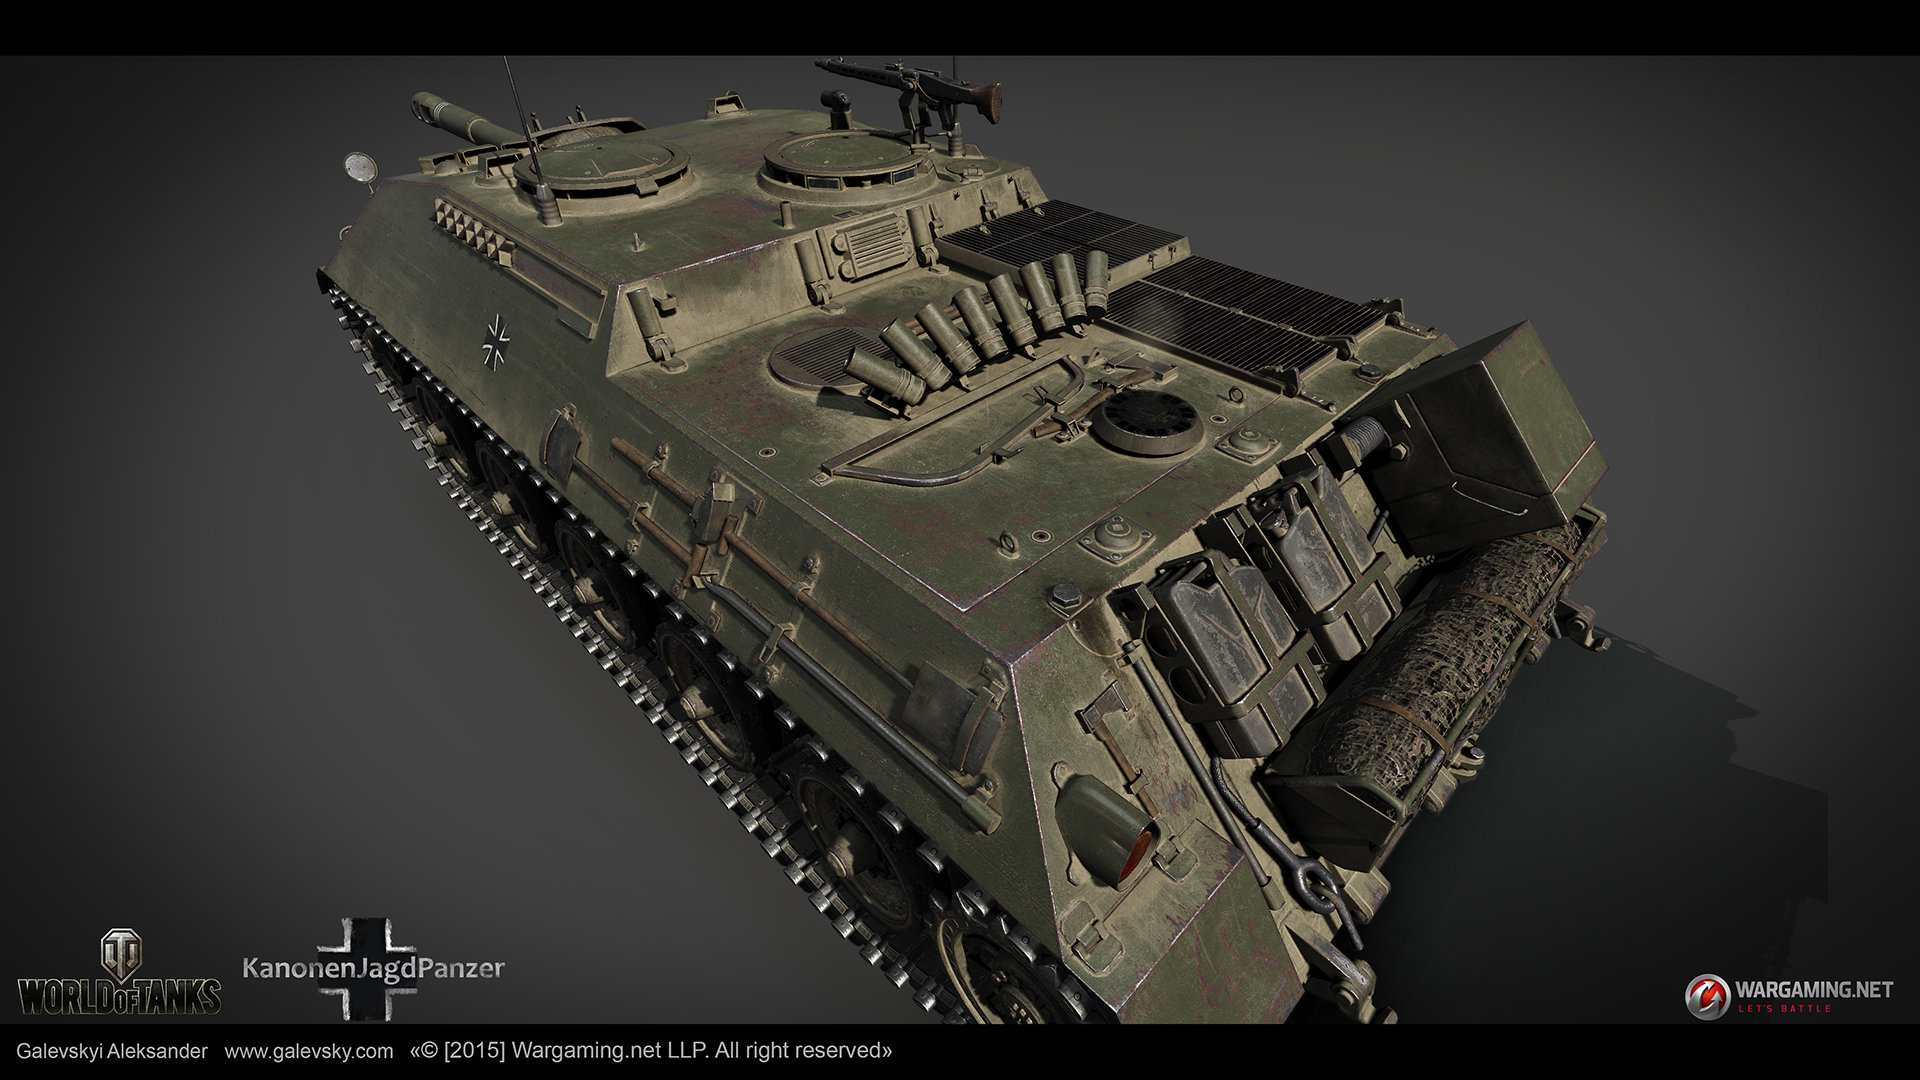 Aleksander galevskyi kanonenjagdpanzer fin small 04